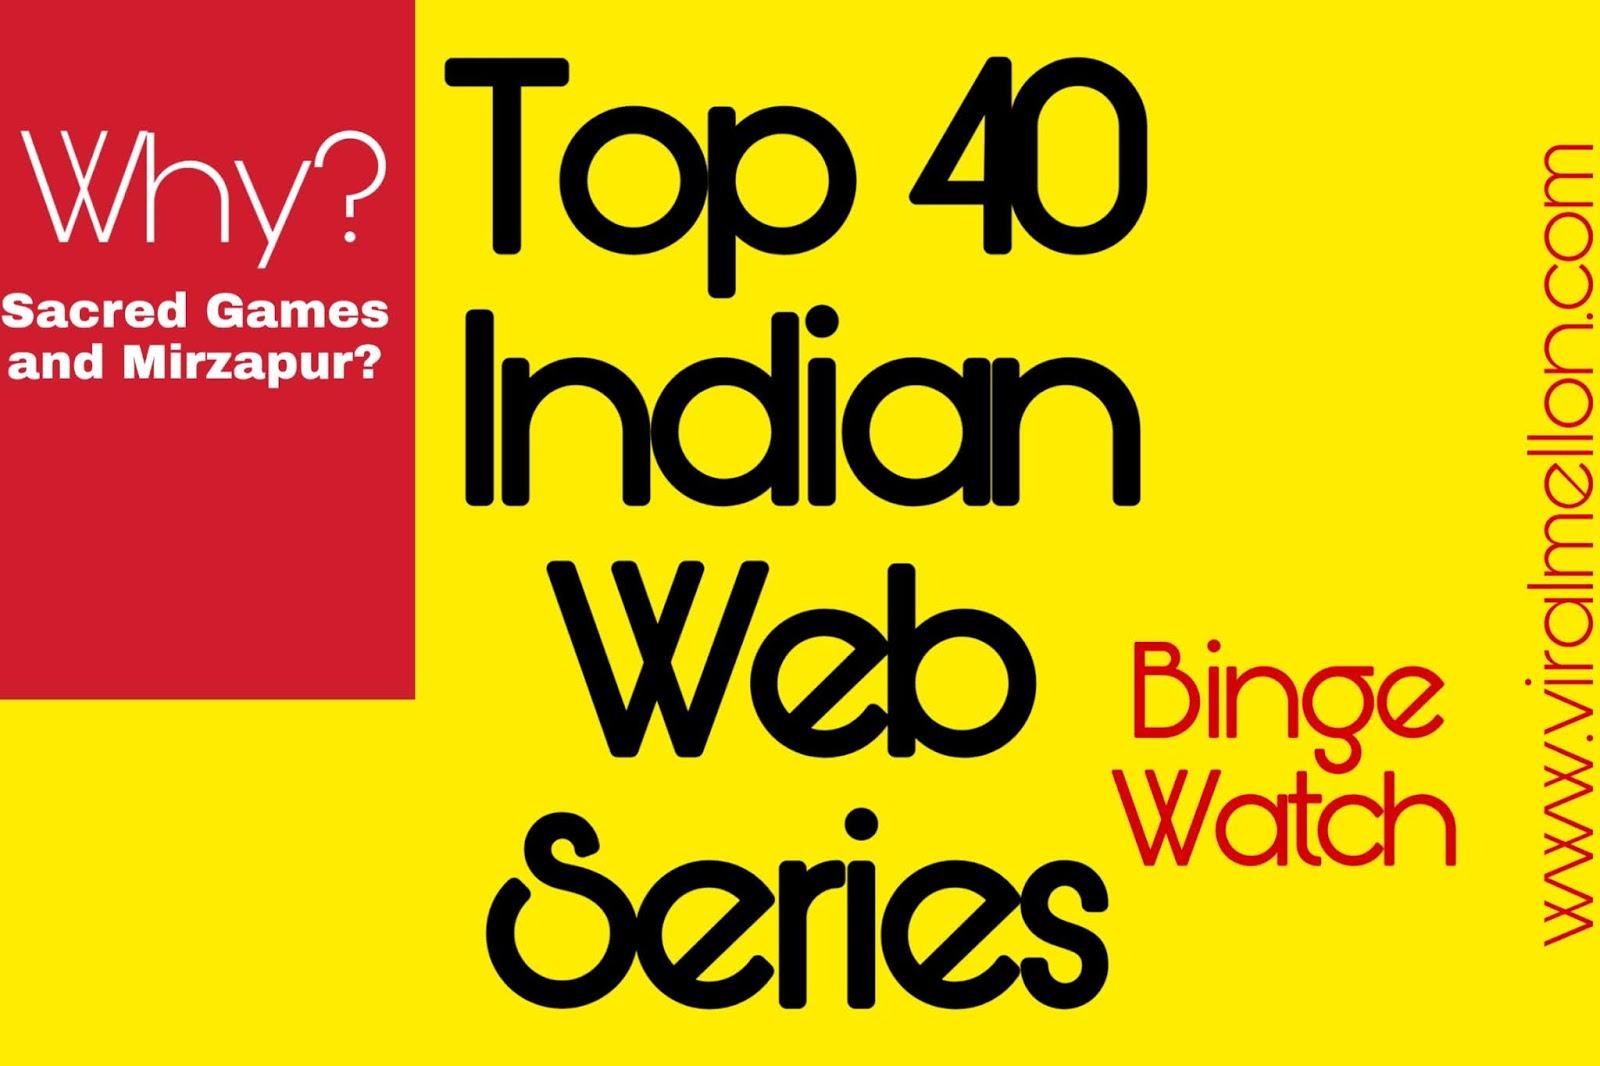 Top 40 Indian Web Series (2019) - Best Hindi Web Series